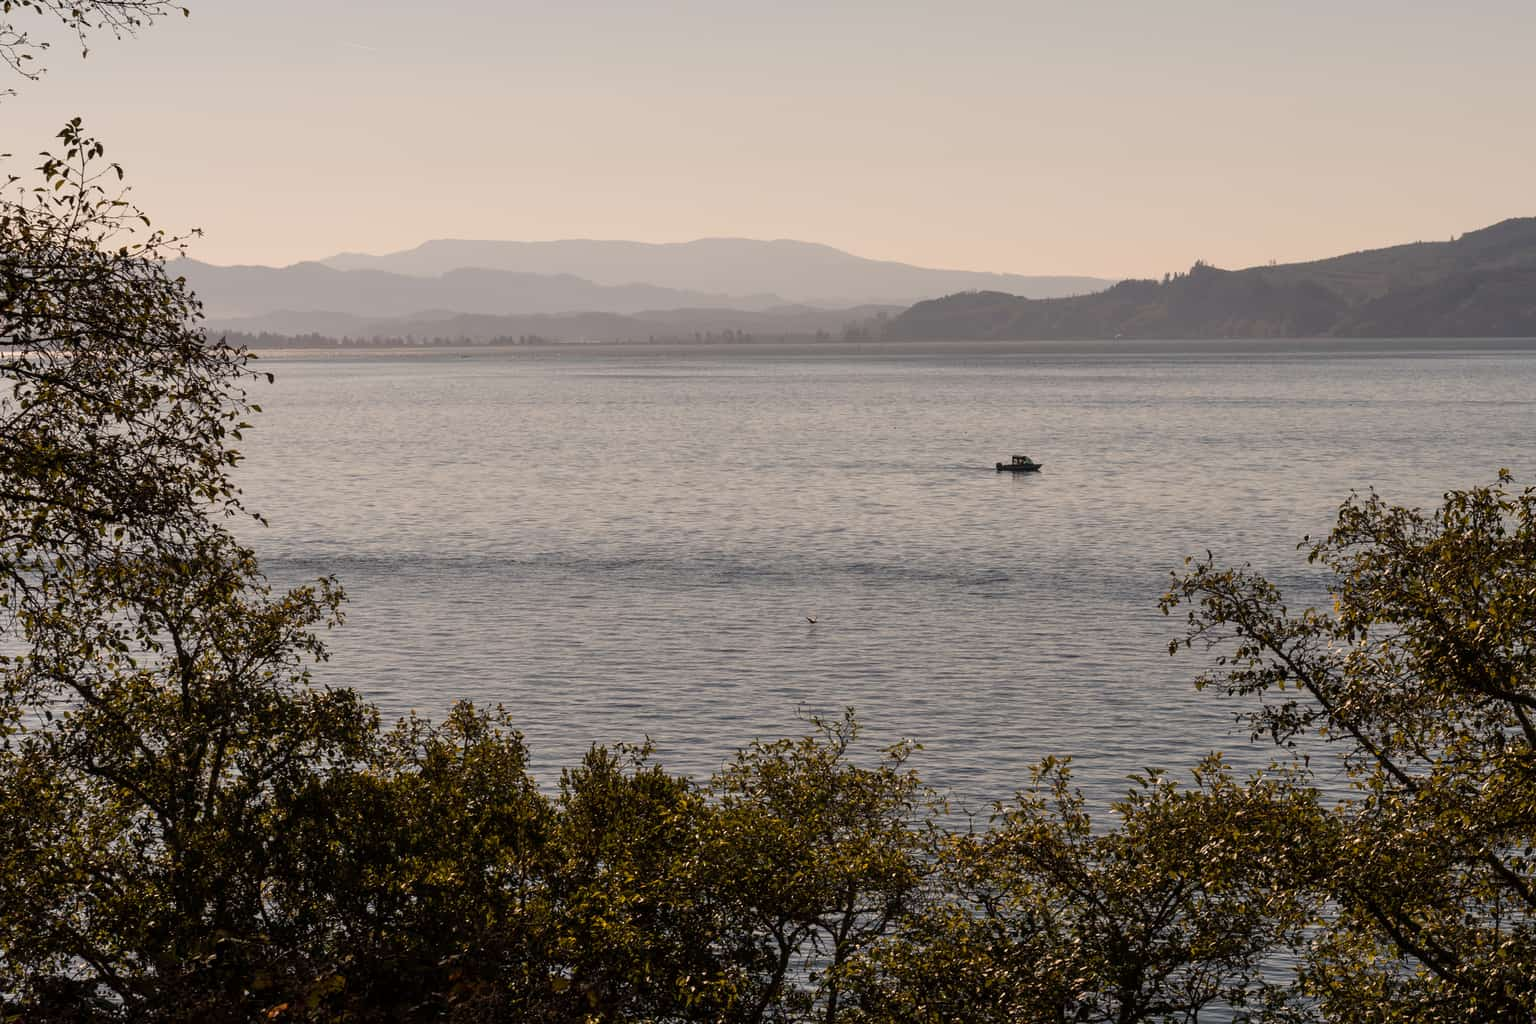 boat motoring on tillamook bay at sunrise